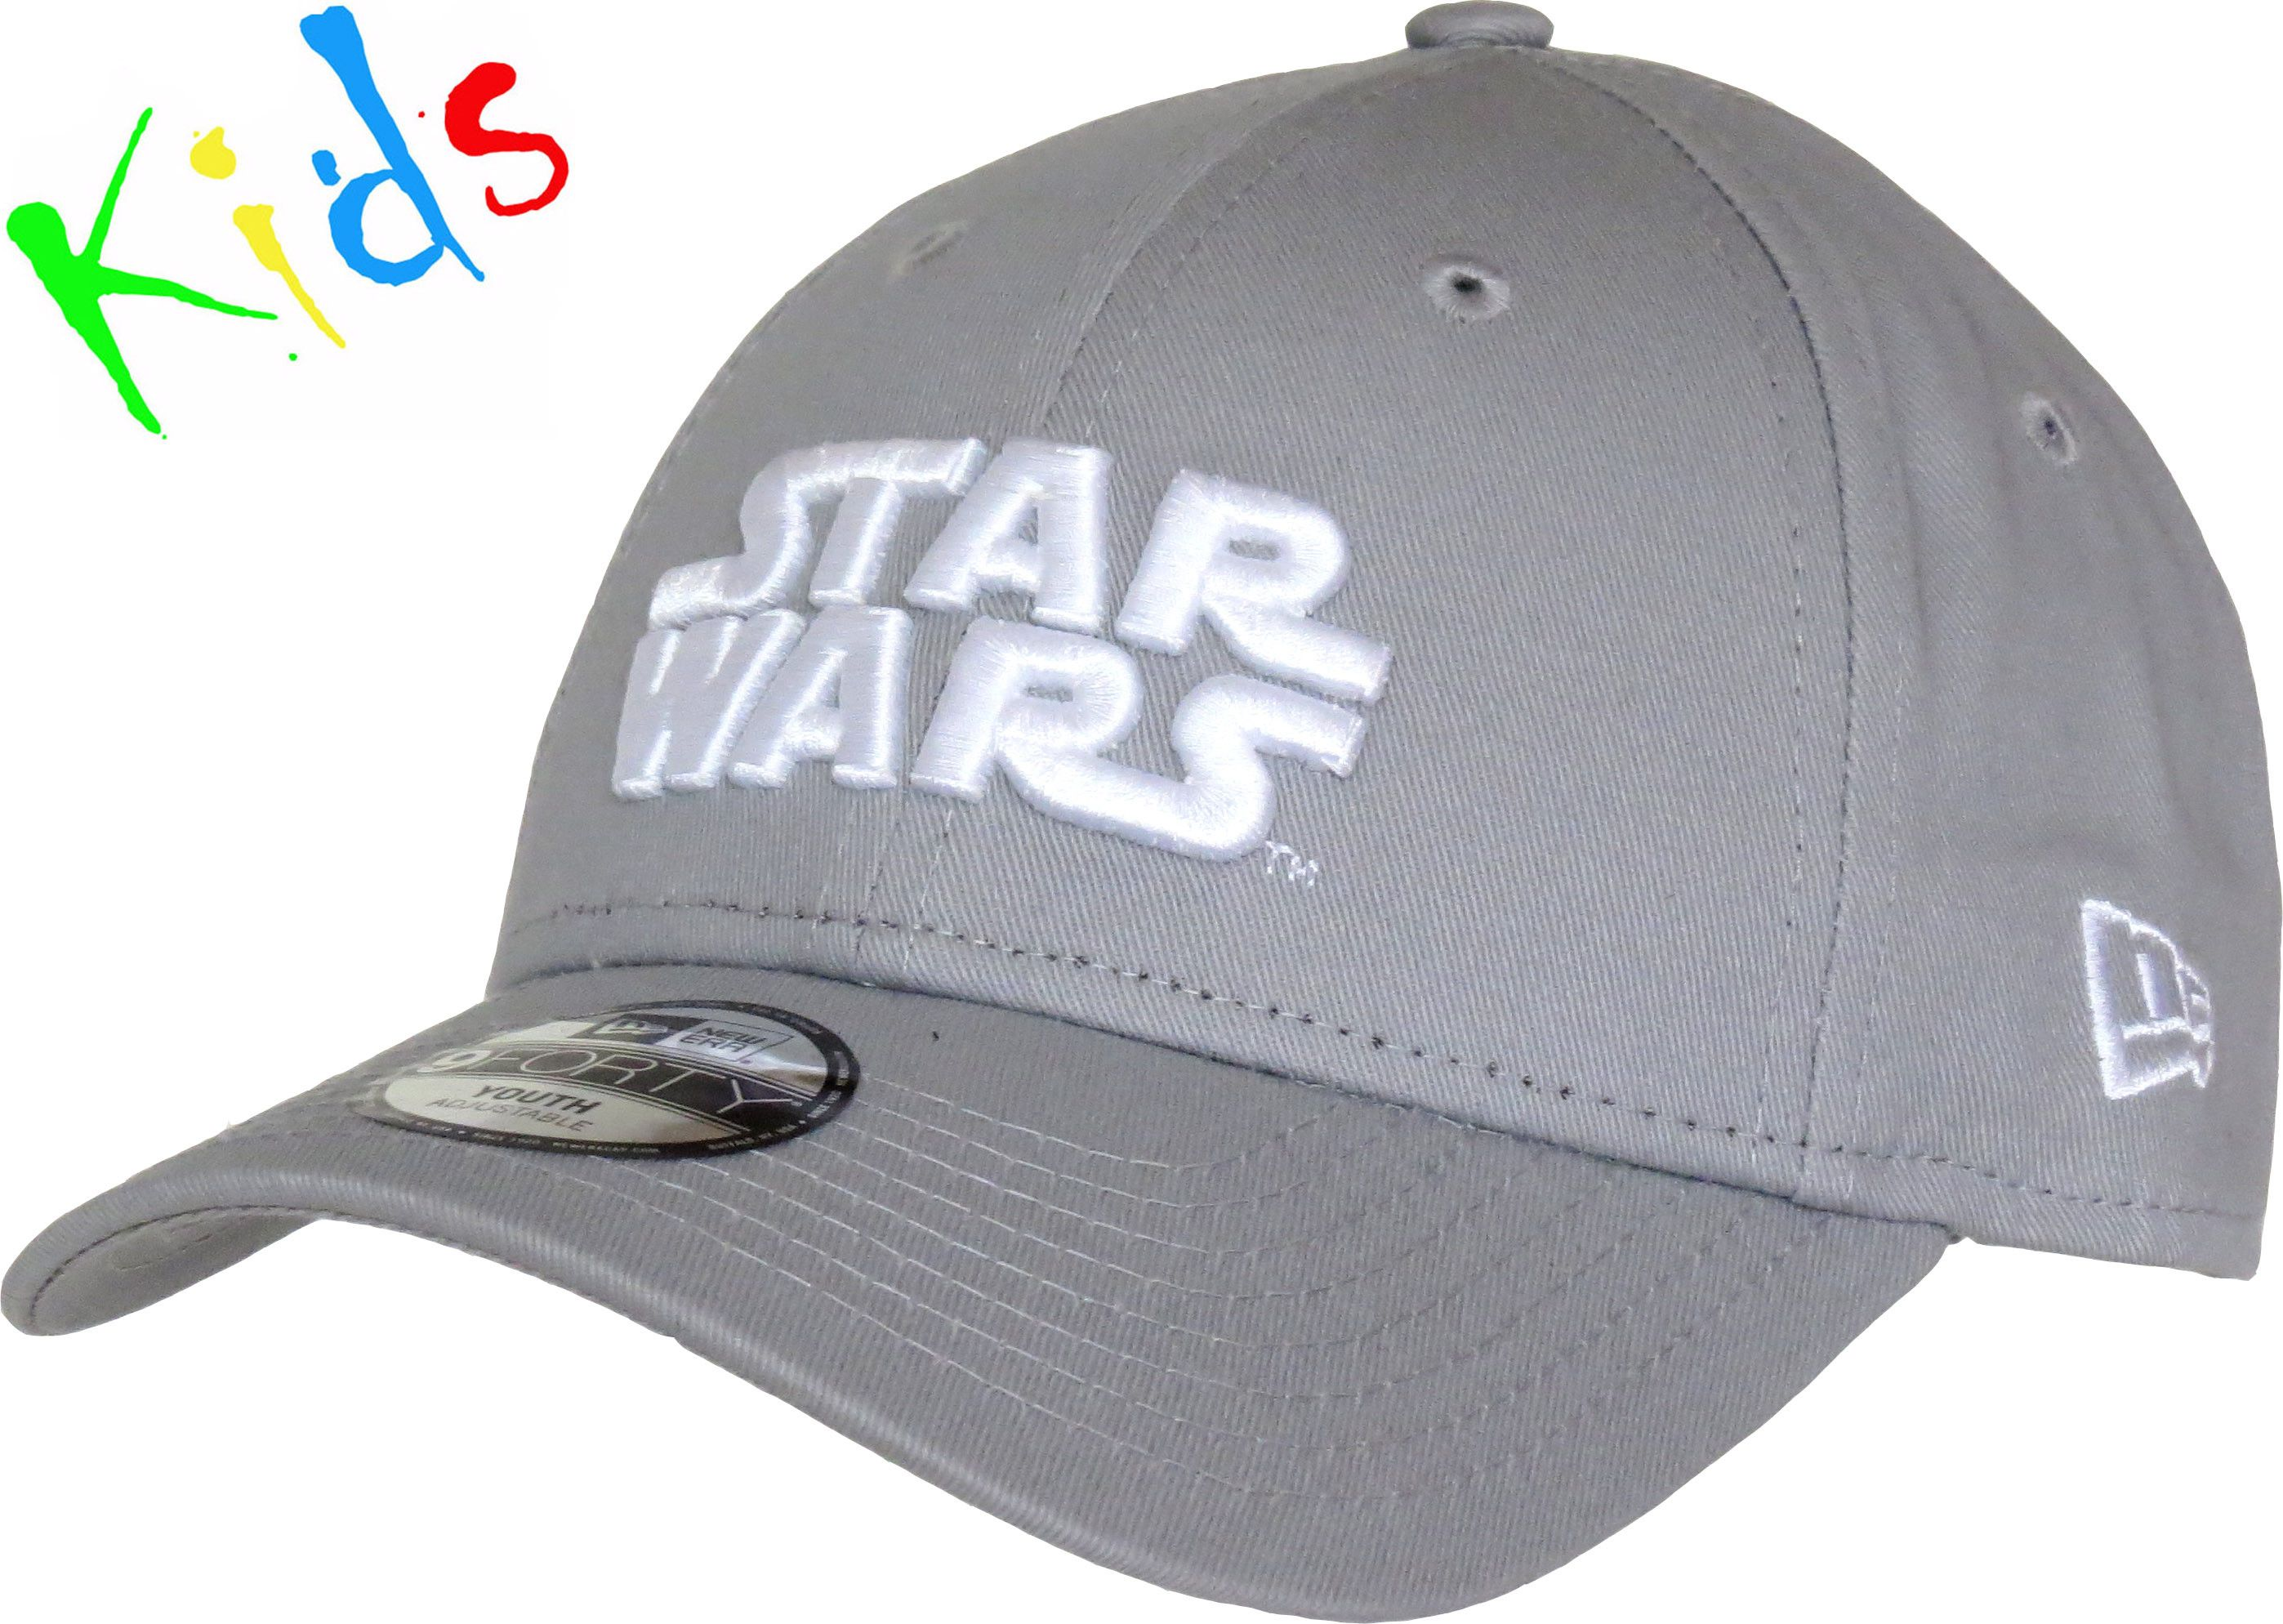 70c253e4c9c New Era Kids 940 Star Wars Essential Adjustable Baseball Cap. Grey with the  Star Wars